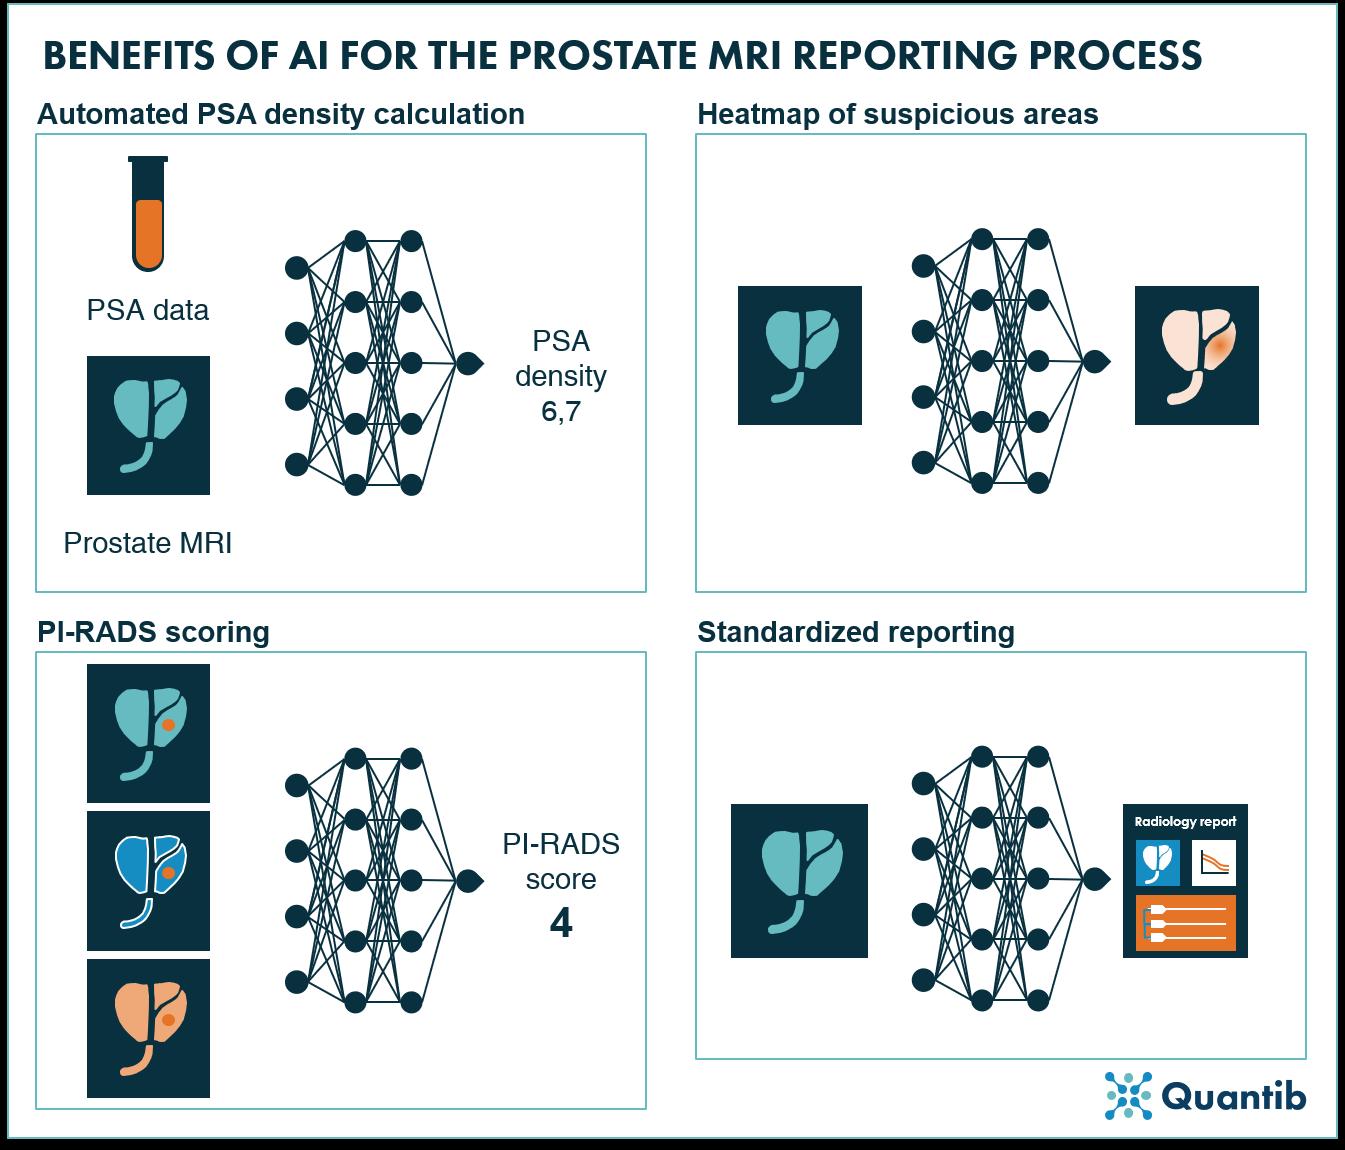 210603 -  Blog Why to adopt AI in prostate MRI - figure 2